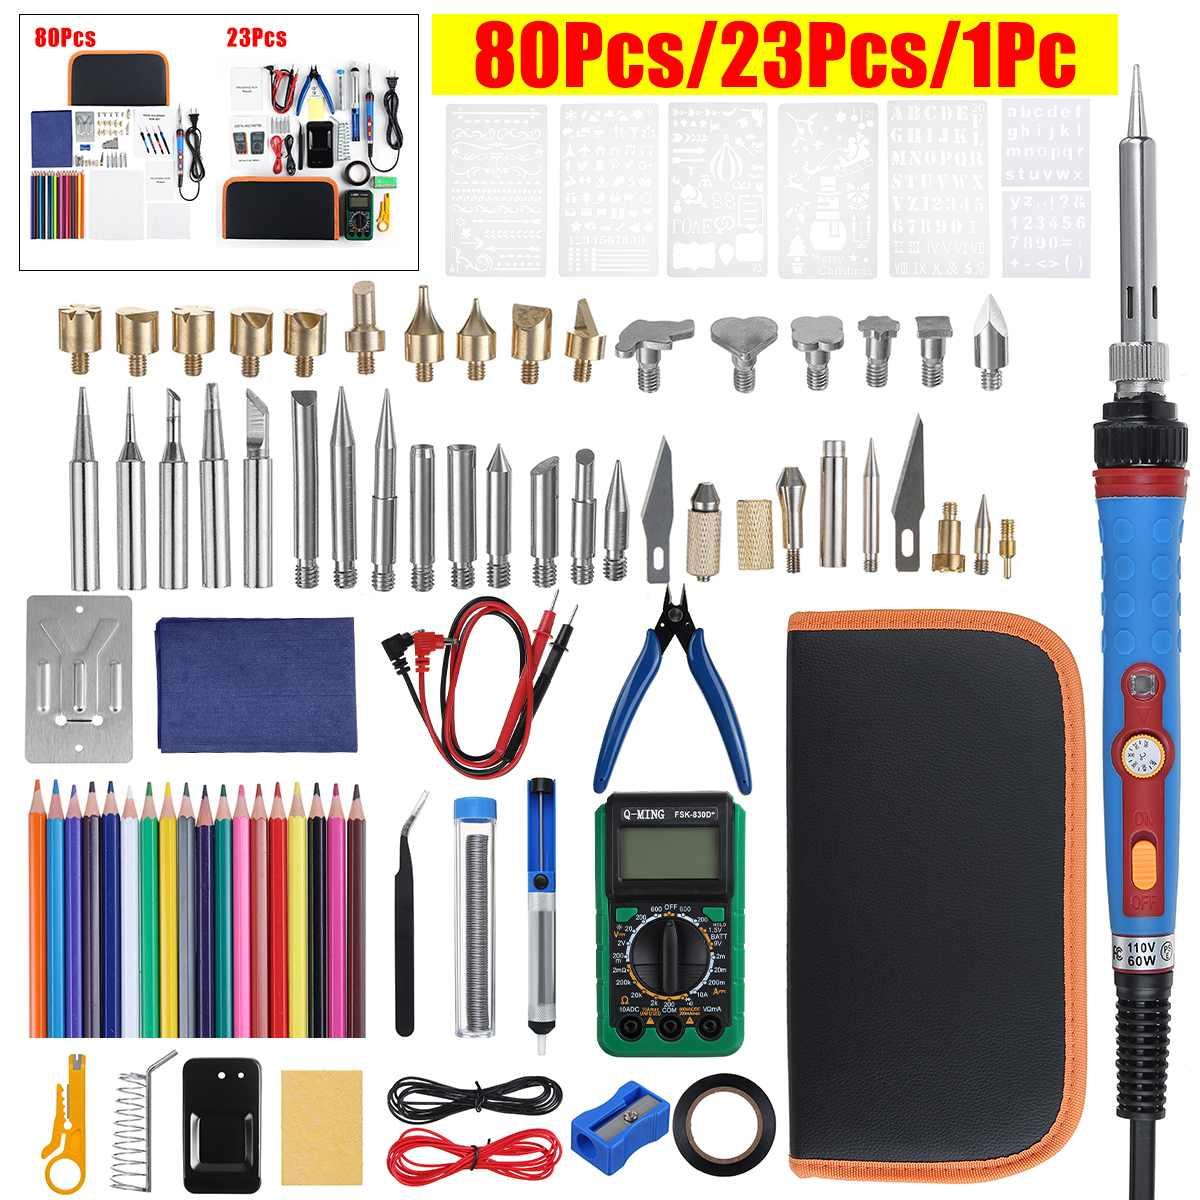 60W Electric Soldering Iron Adjustable Temperature Digital Multimeter Wood Burning Pen Wire Stripper Cutter Welding Equipment